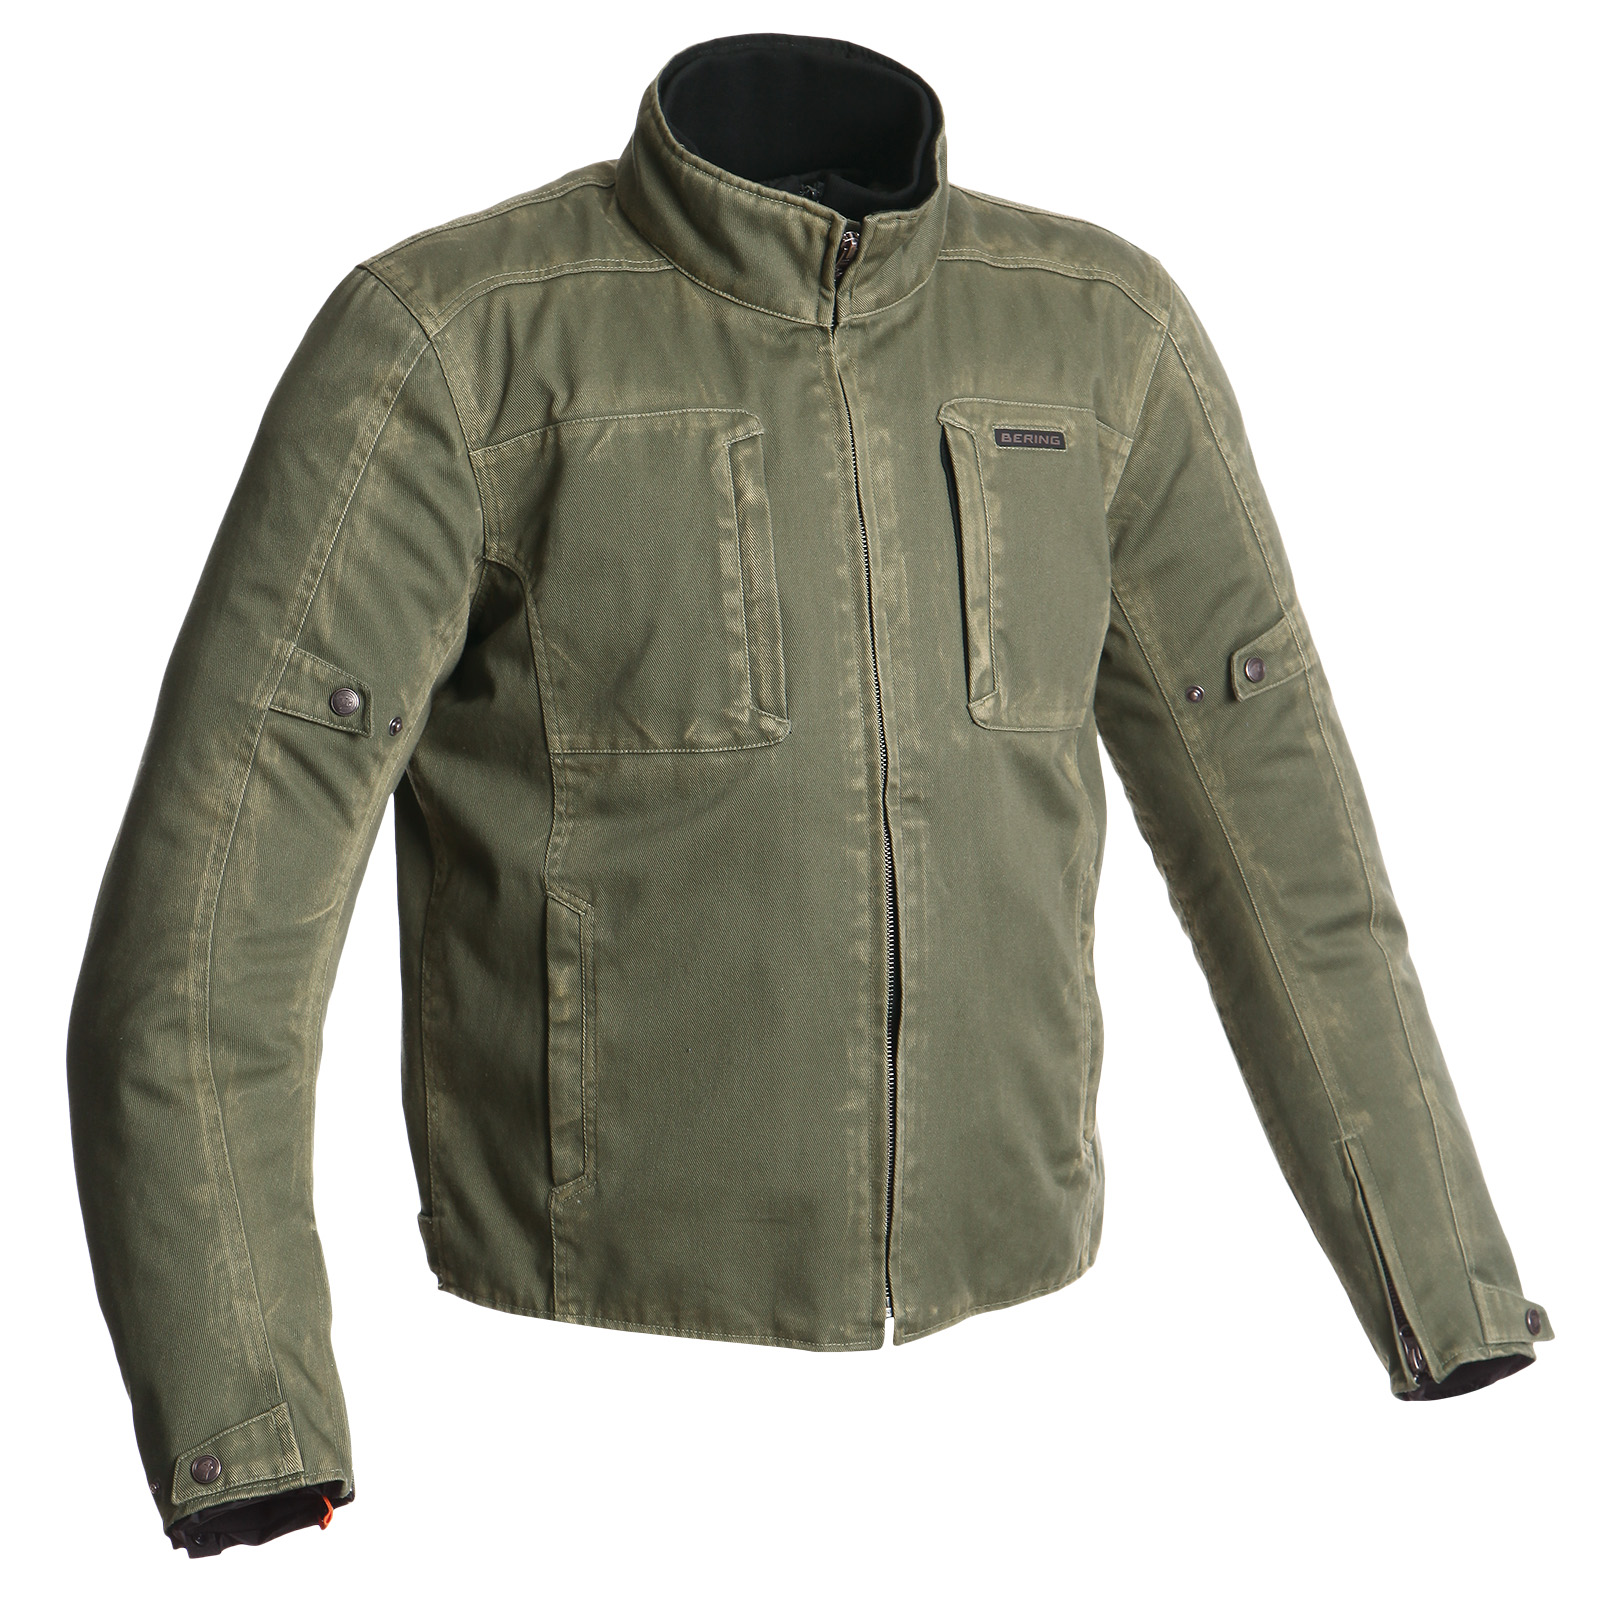 9b20d5b8c8 Brody - BTB019, BTB010 - Textil dzseki - Bering motoros ruházat ...